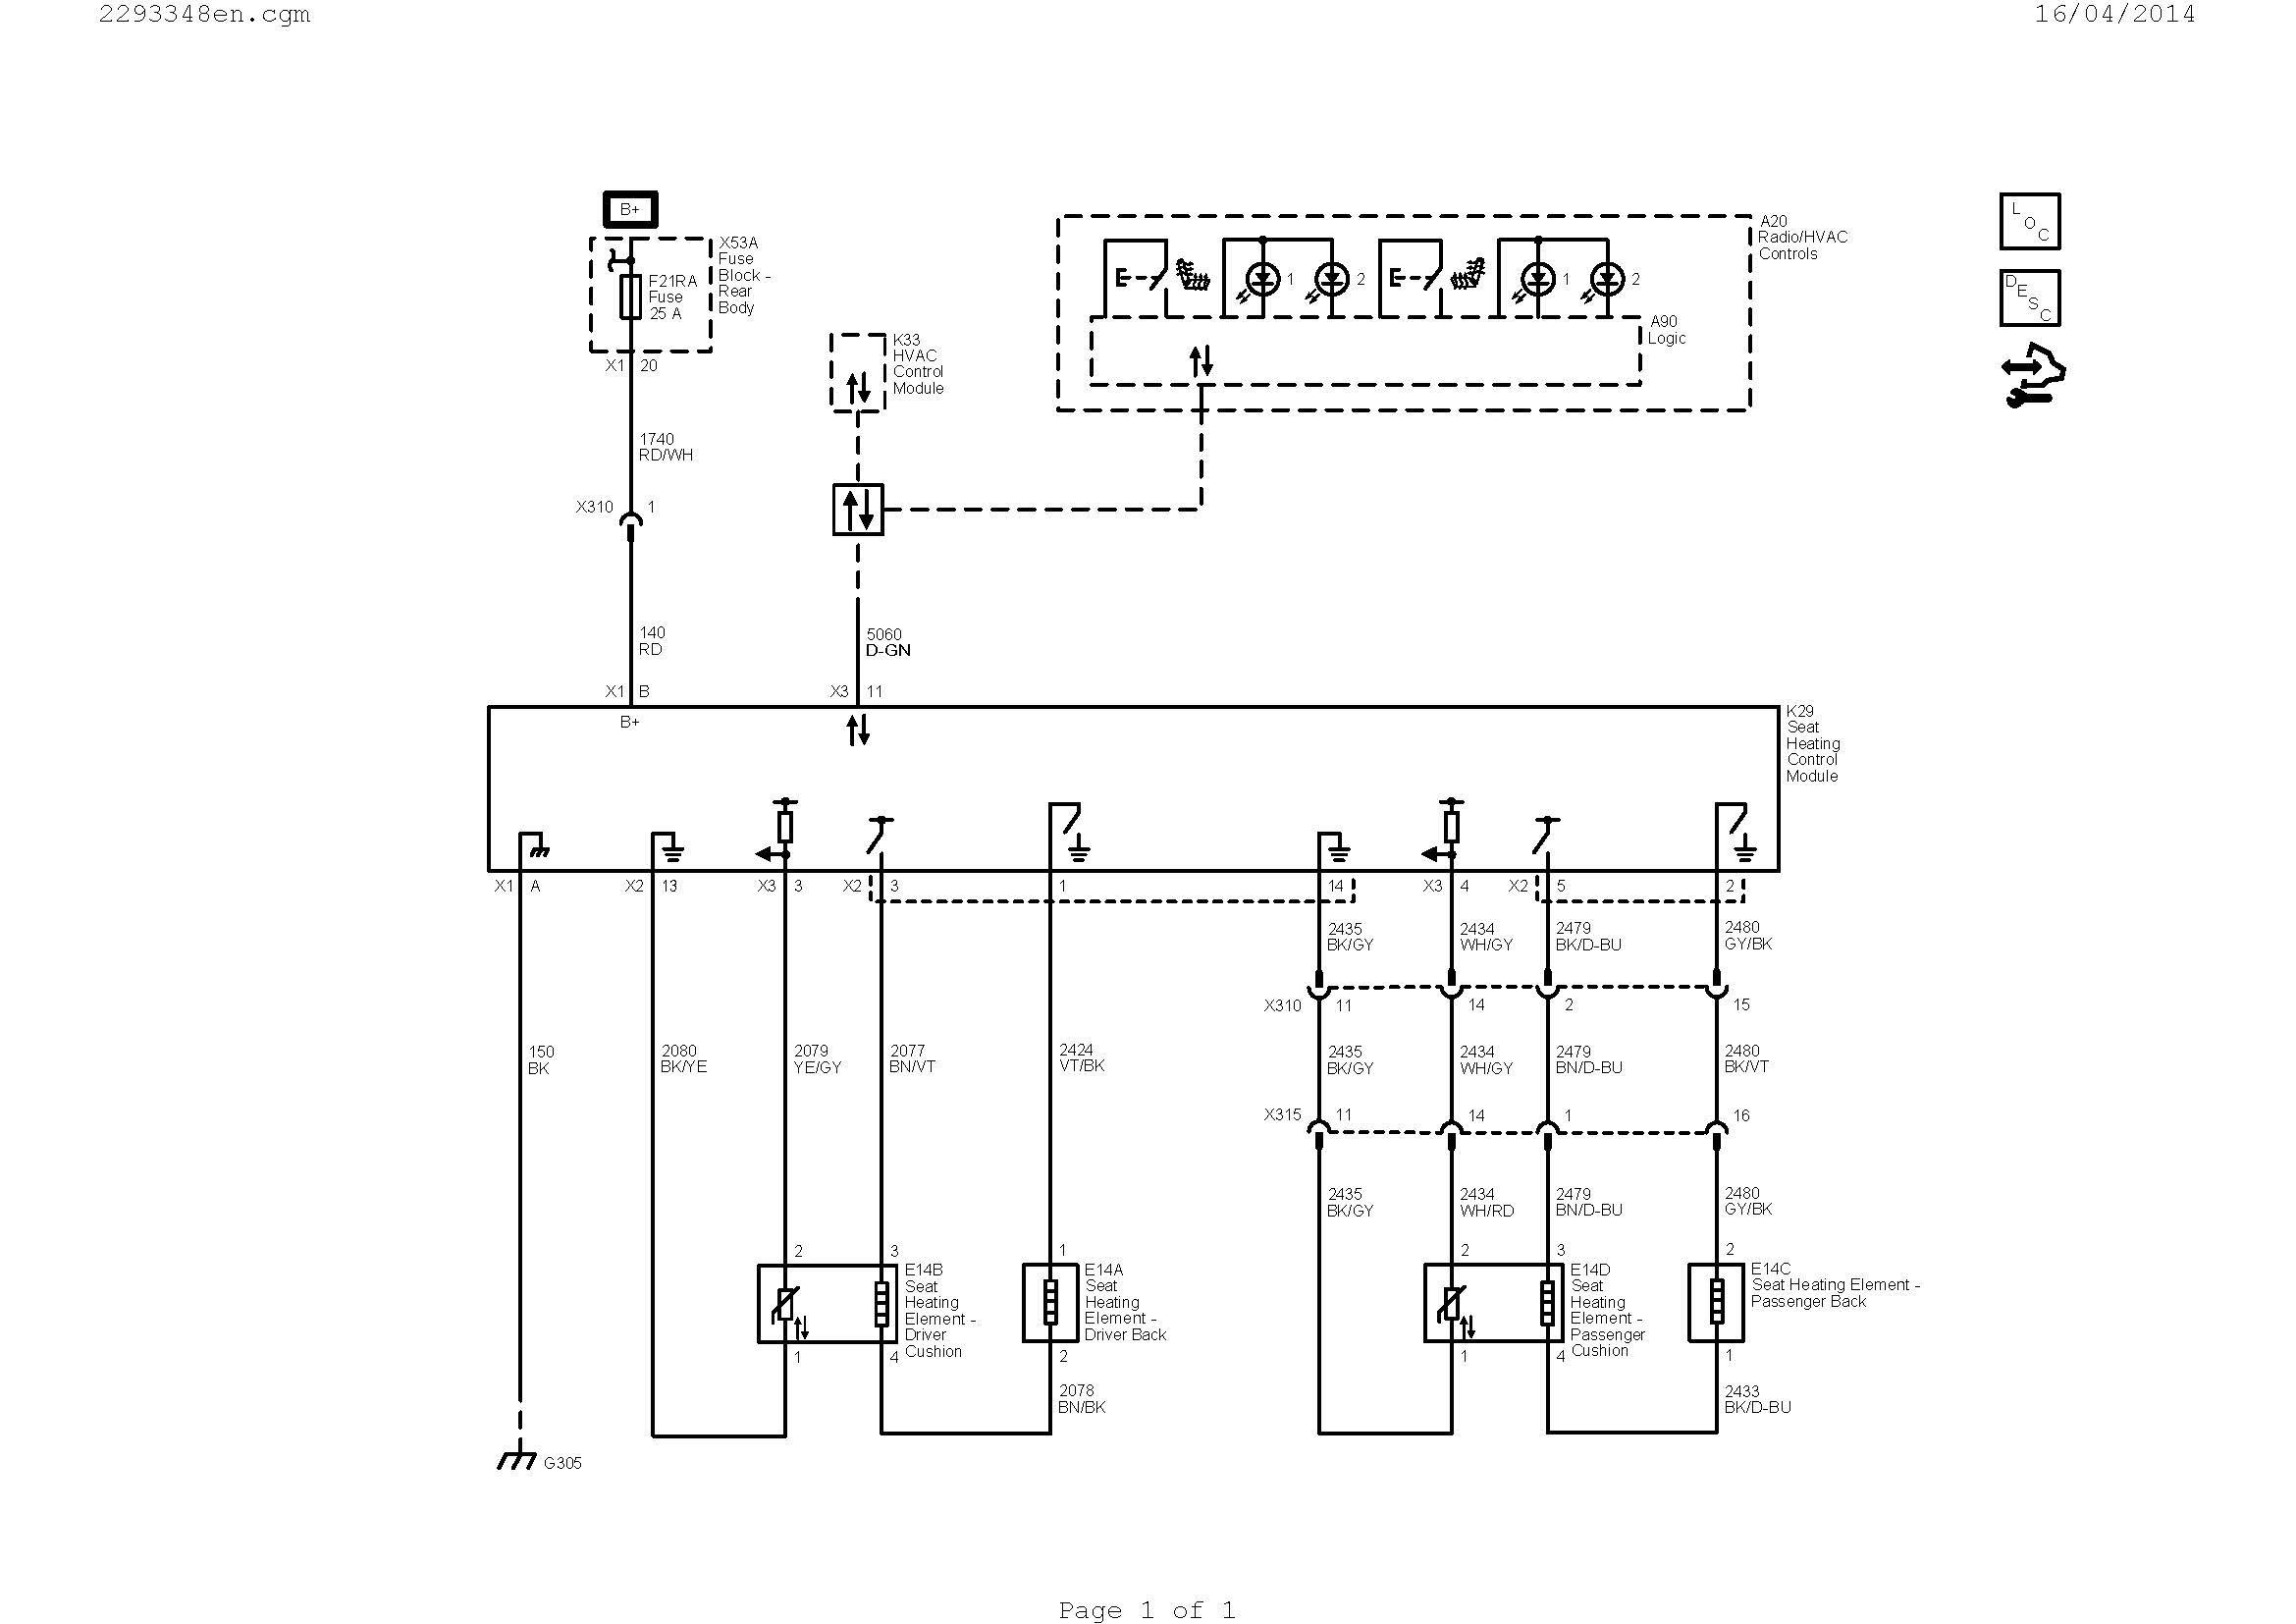 nest thermostat wiring diagram Download-Nest Wireless thermostat Wiring Diagram Refrence Wiring Diagram Ac Valid Hvac Diagram Best Hvac Diagram 0d 15-h